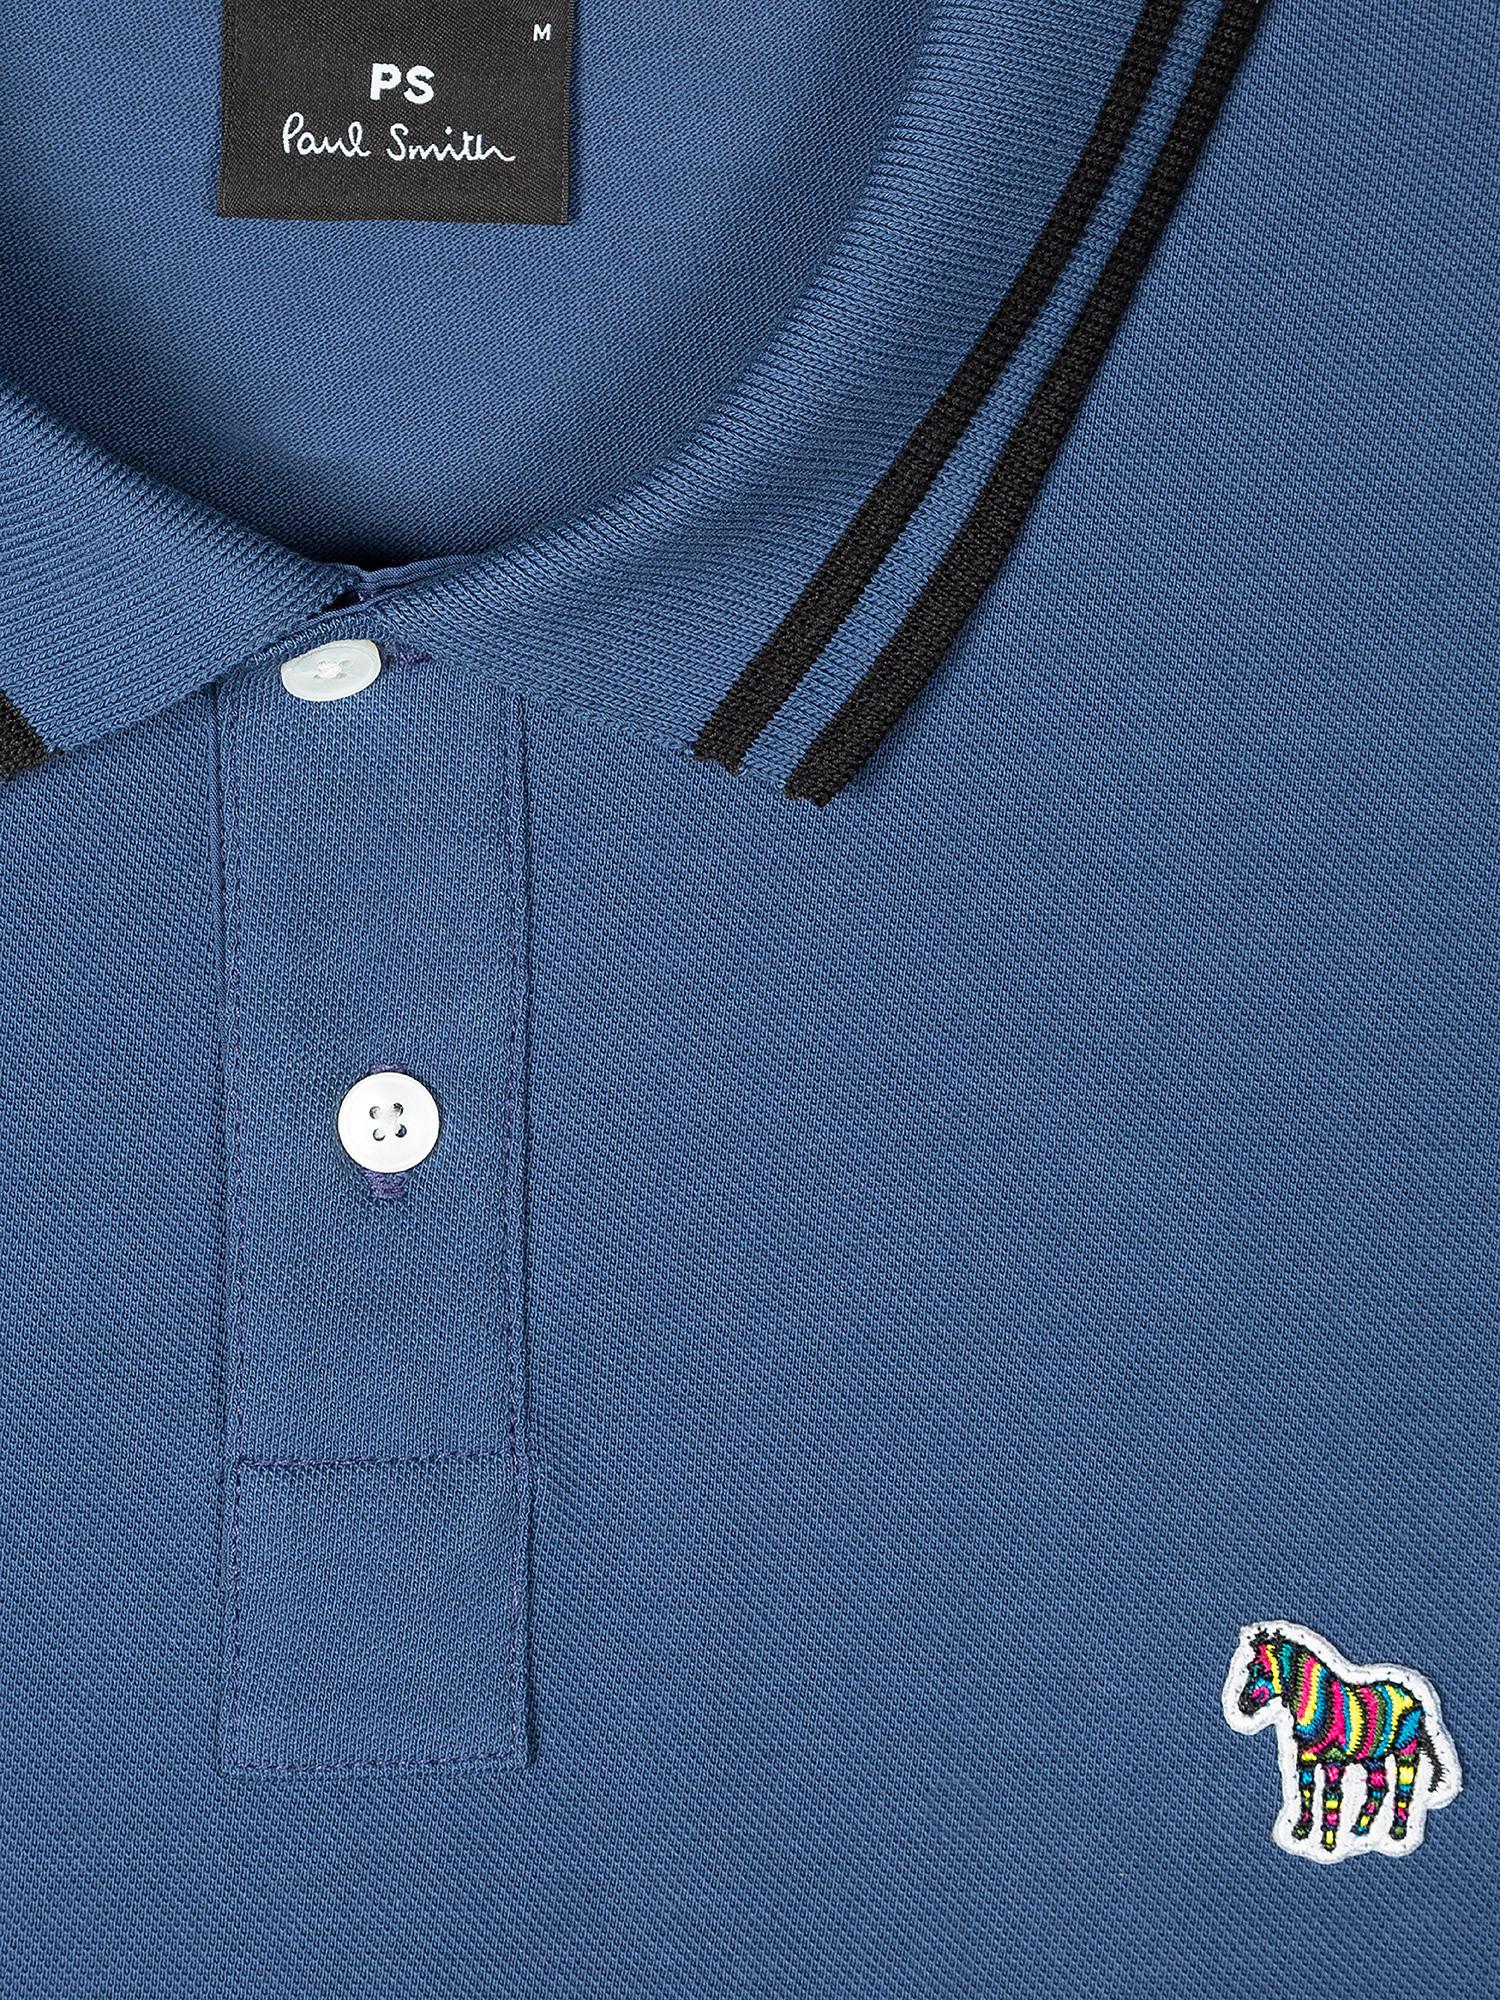 Polo Uomo Mc Vestibilita' Stretta, Blu, large image number 1